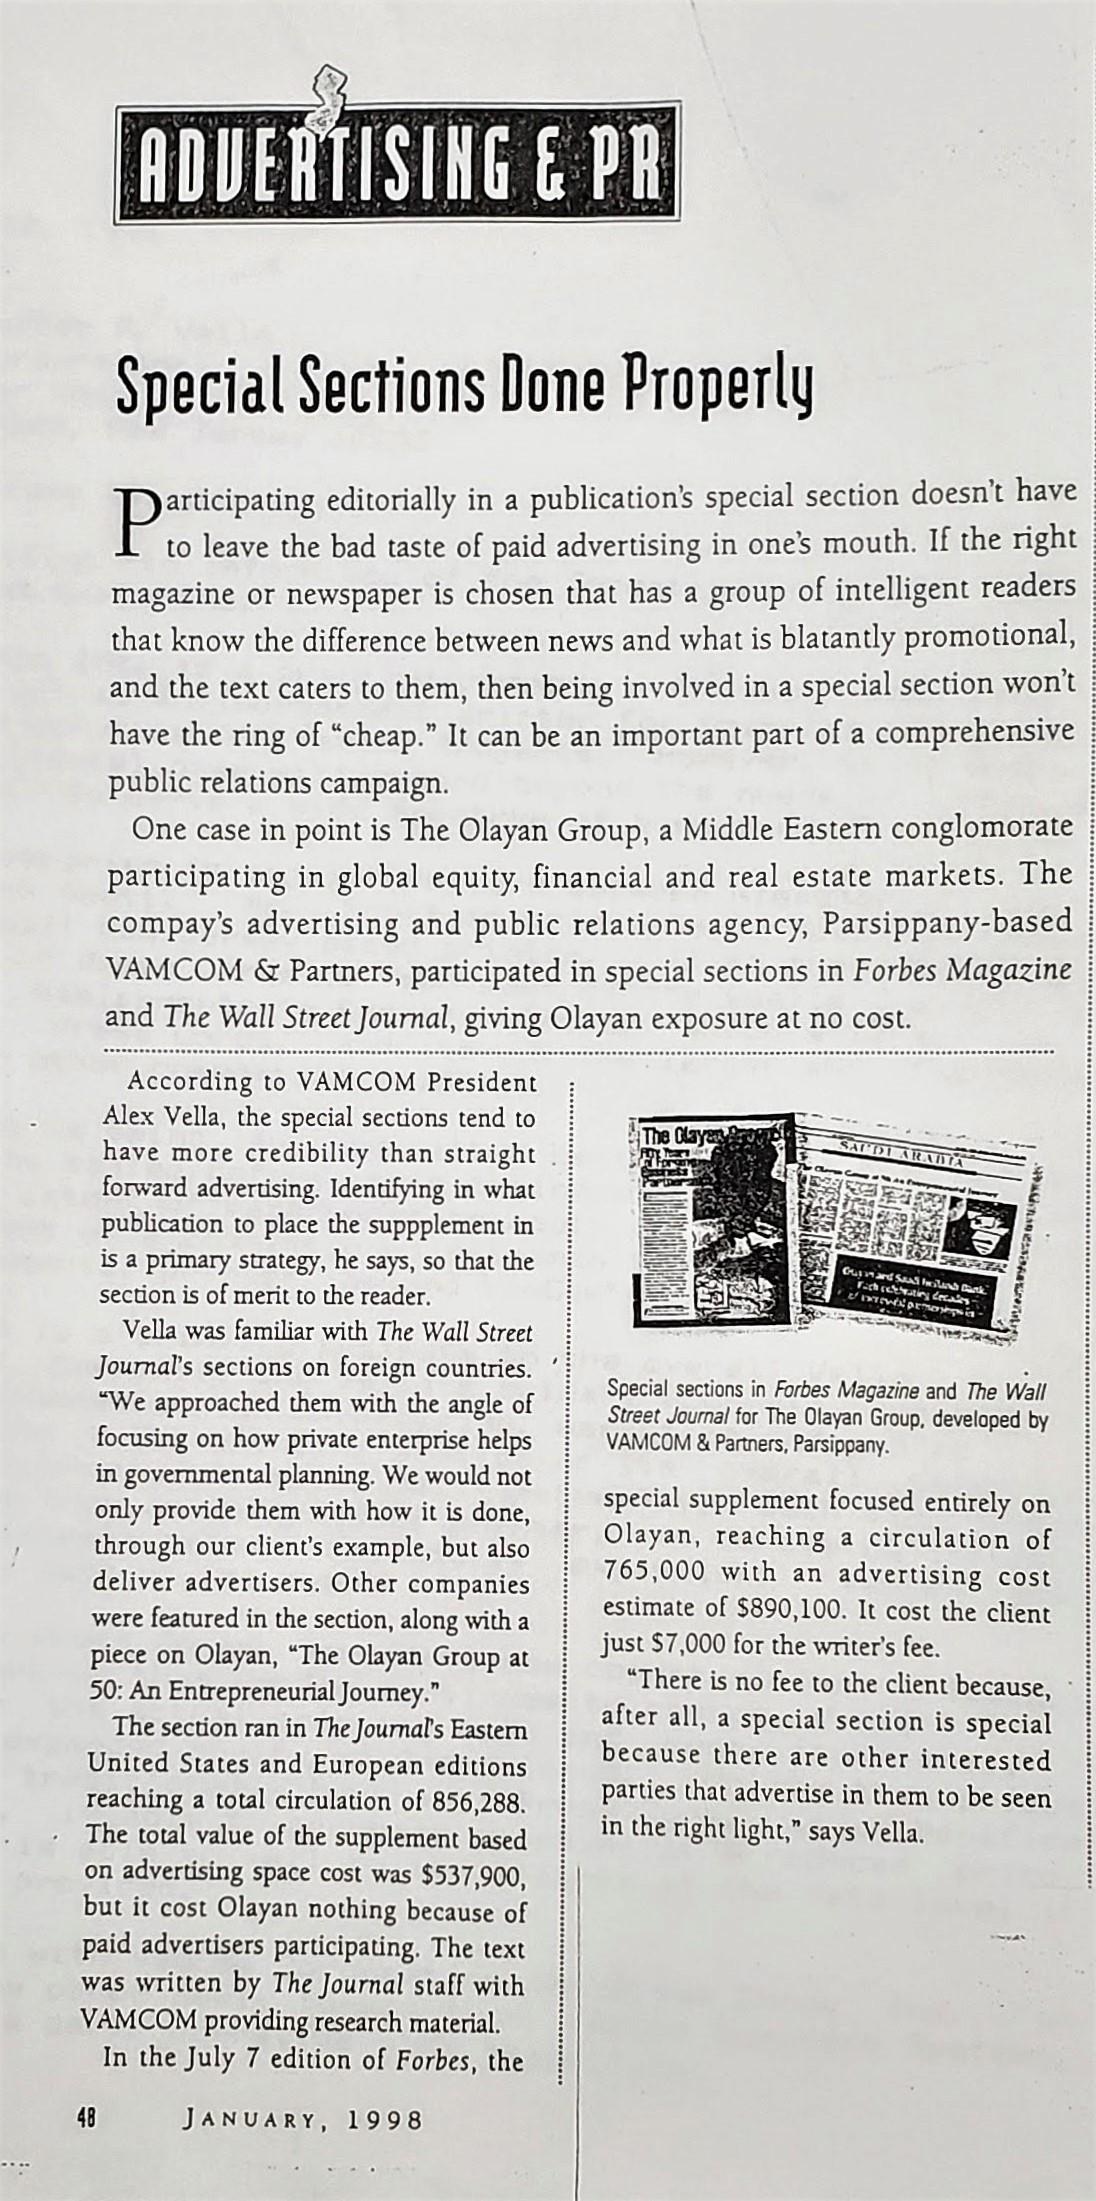 1998-1_olayan_advertising & pr_done properly_1